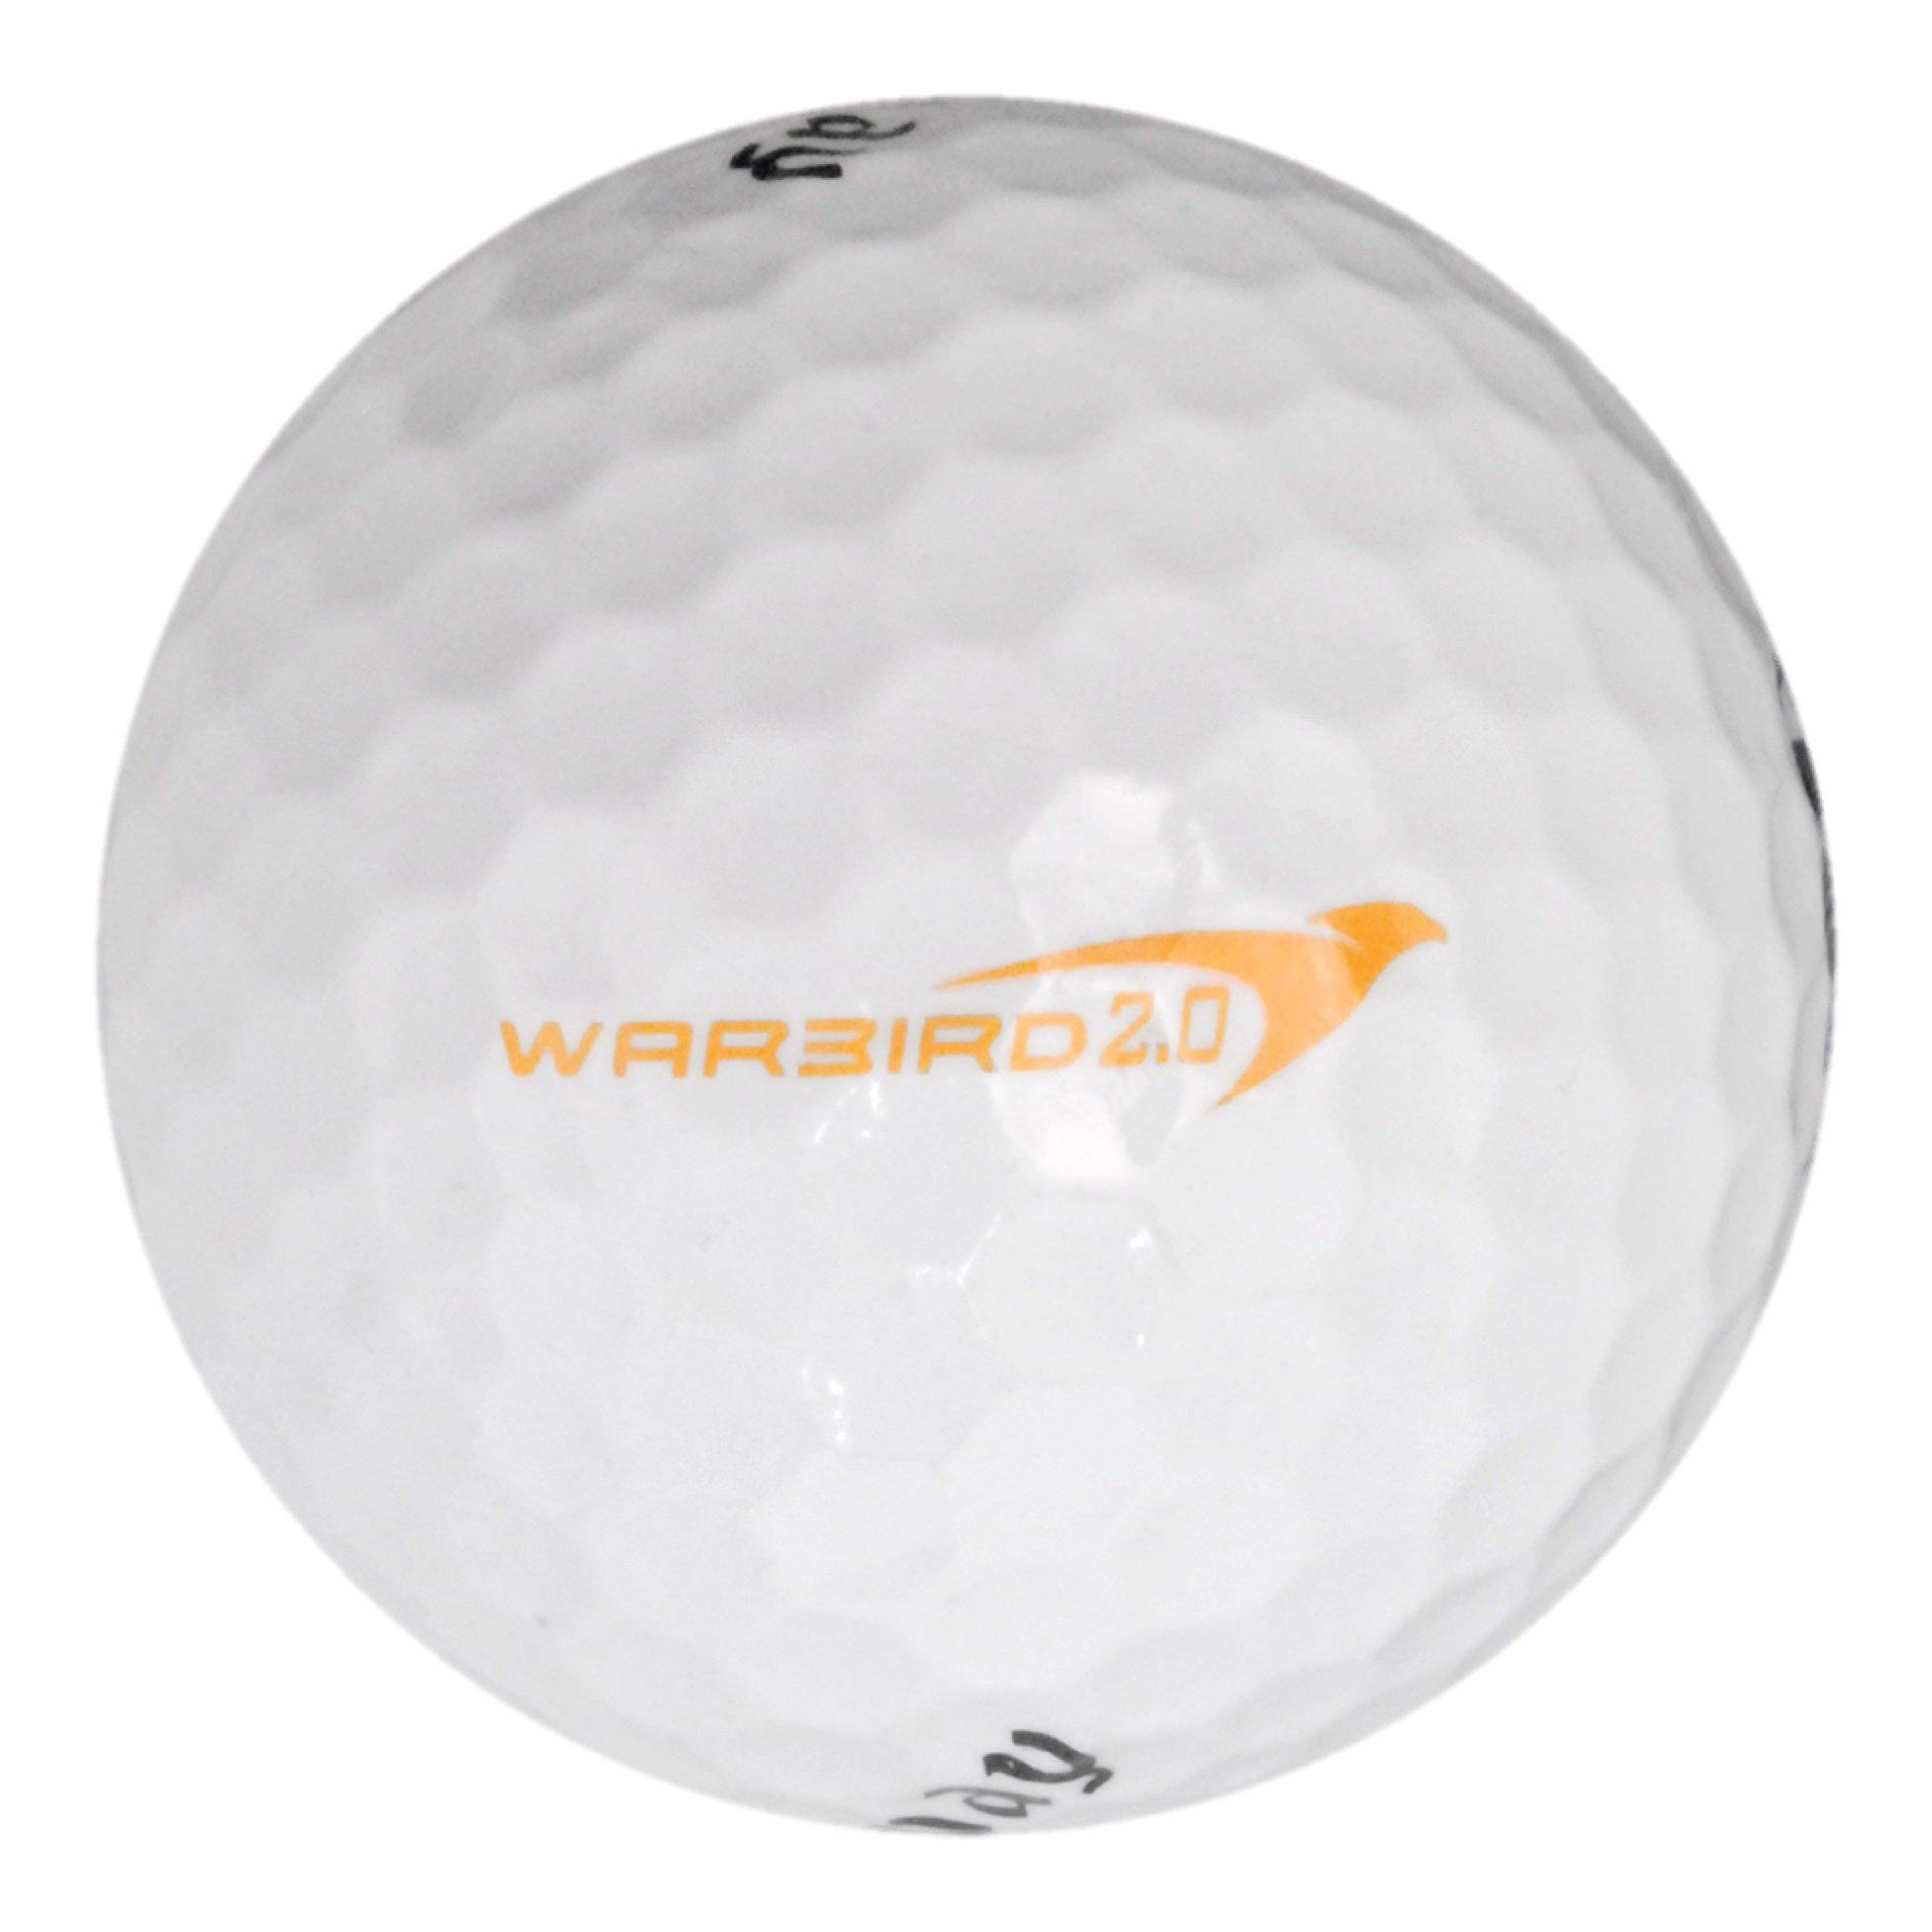 132 Callaway Warbird - Value (AAA) Grade - Recycled (Used) Golf Balls by Callaway (Image #3)